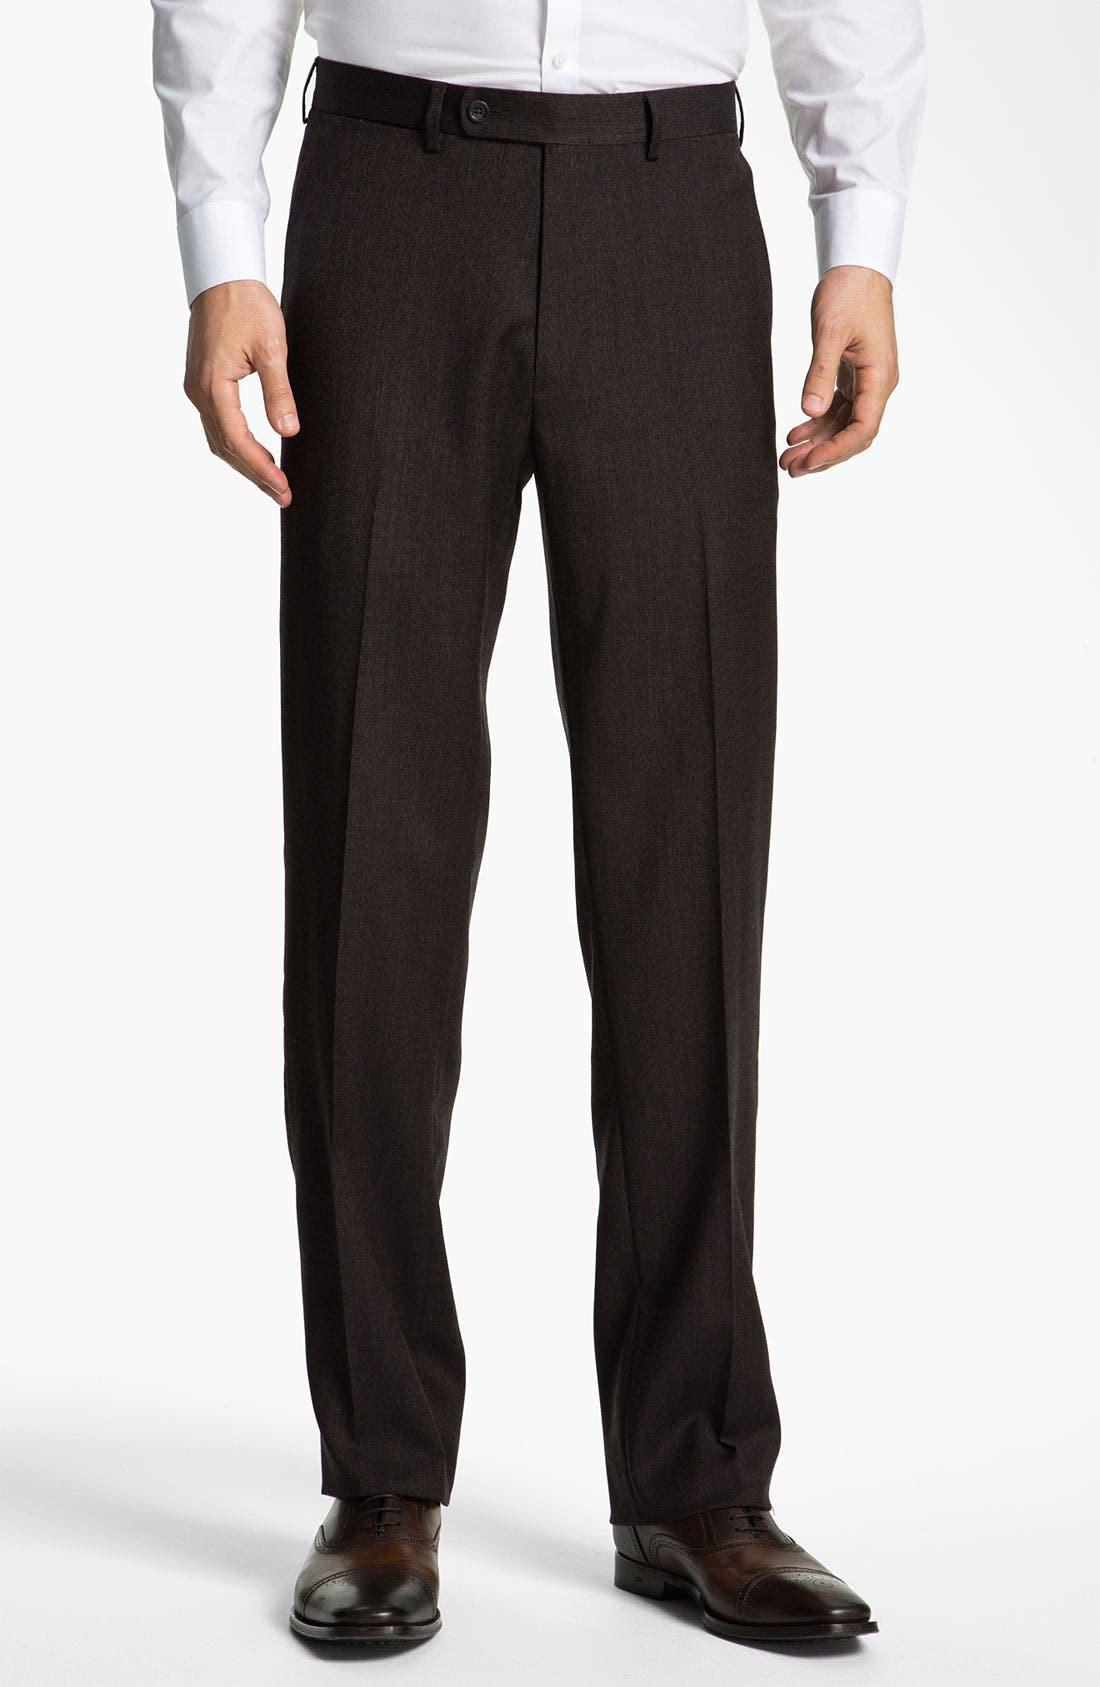 Main Image - Peter Millar 'Hi Low' Flat Front Wool Trousers